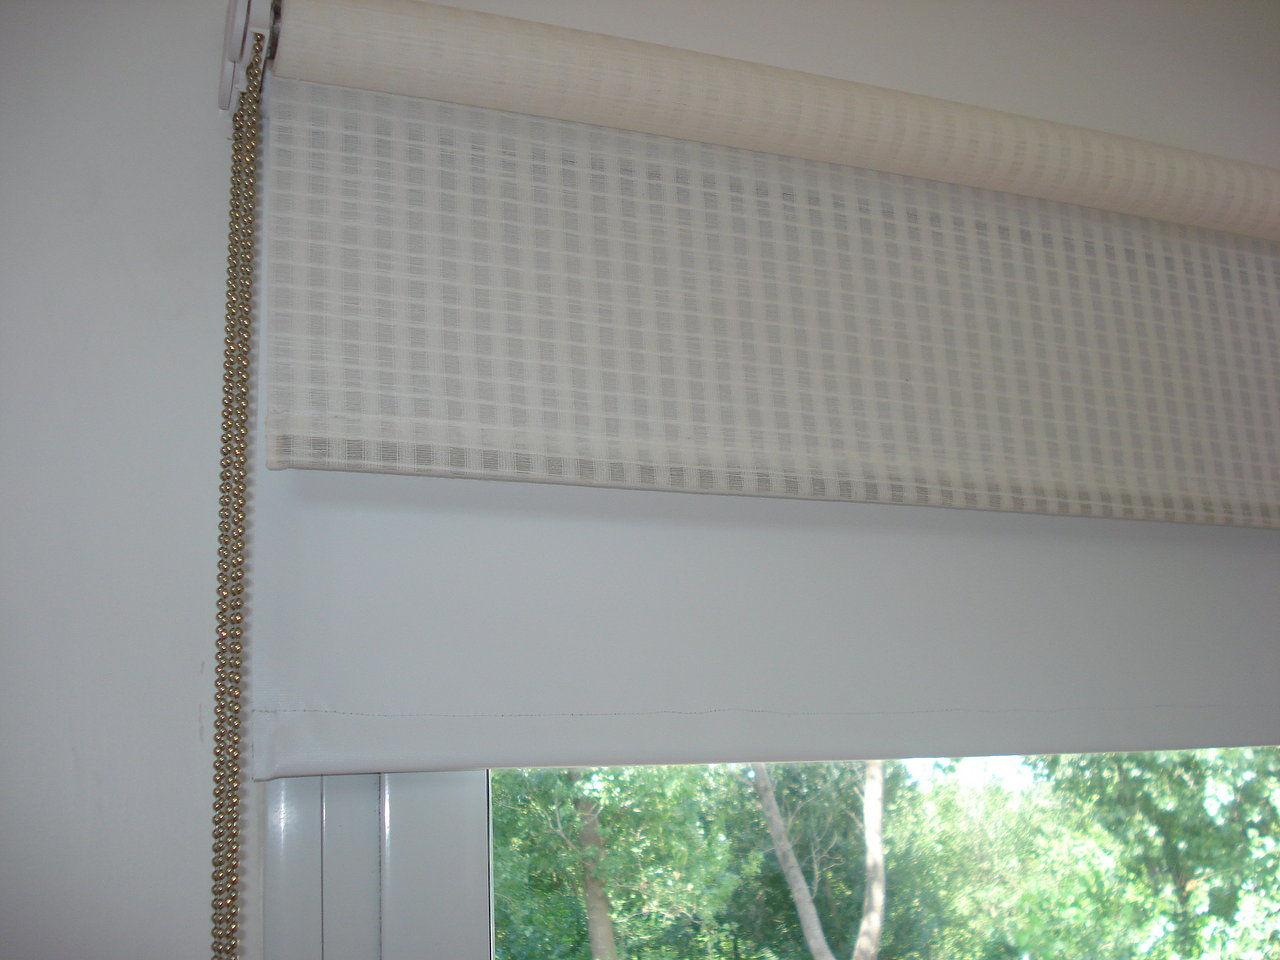 Celamik roller fabrica de cortinas roller - Cortinas roller black out ...